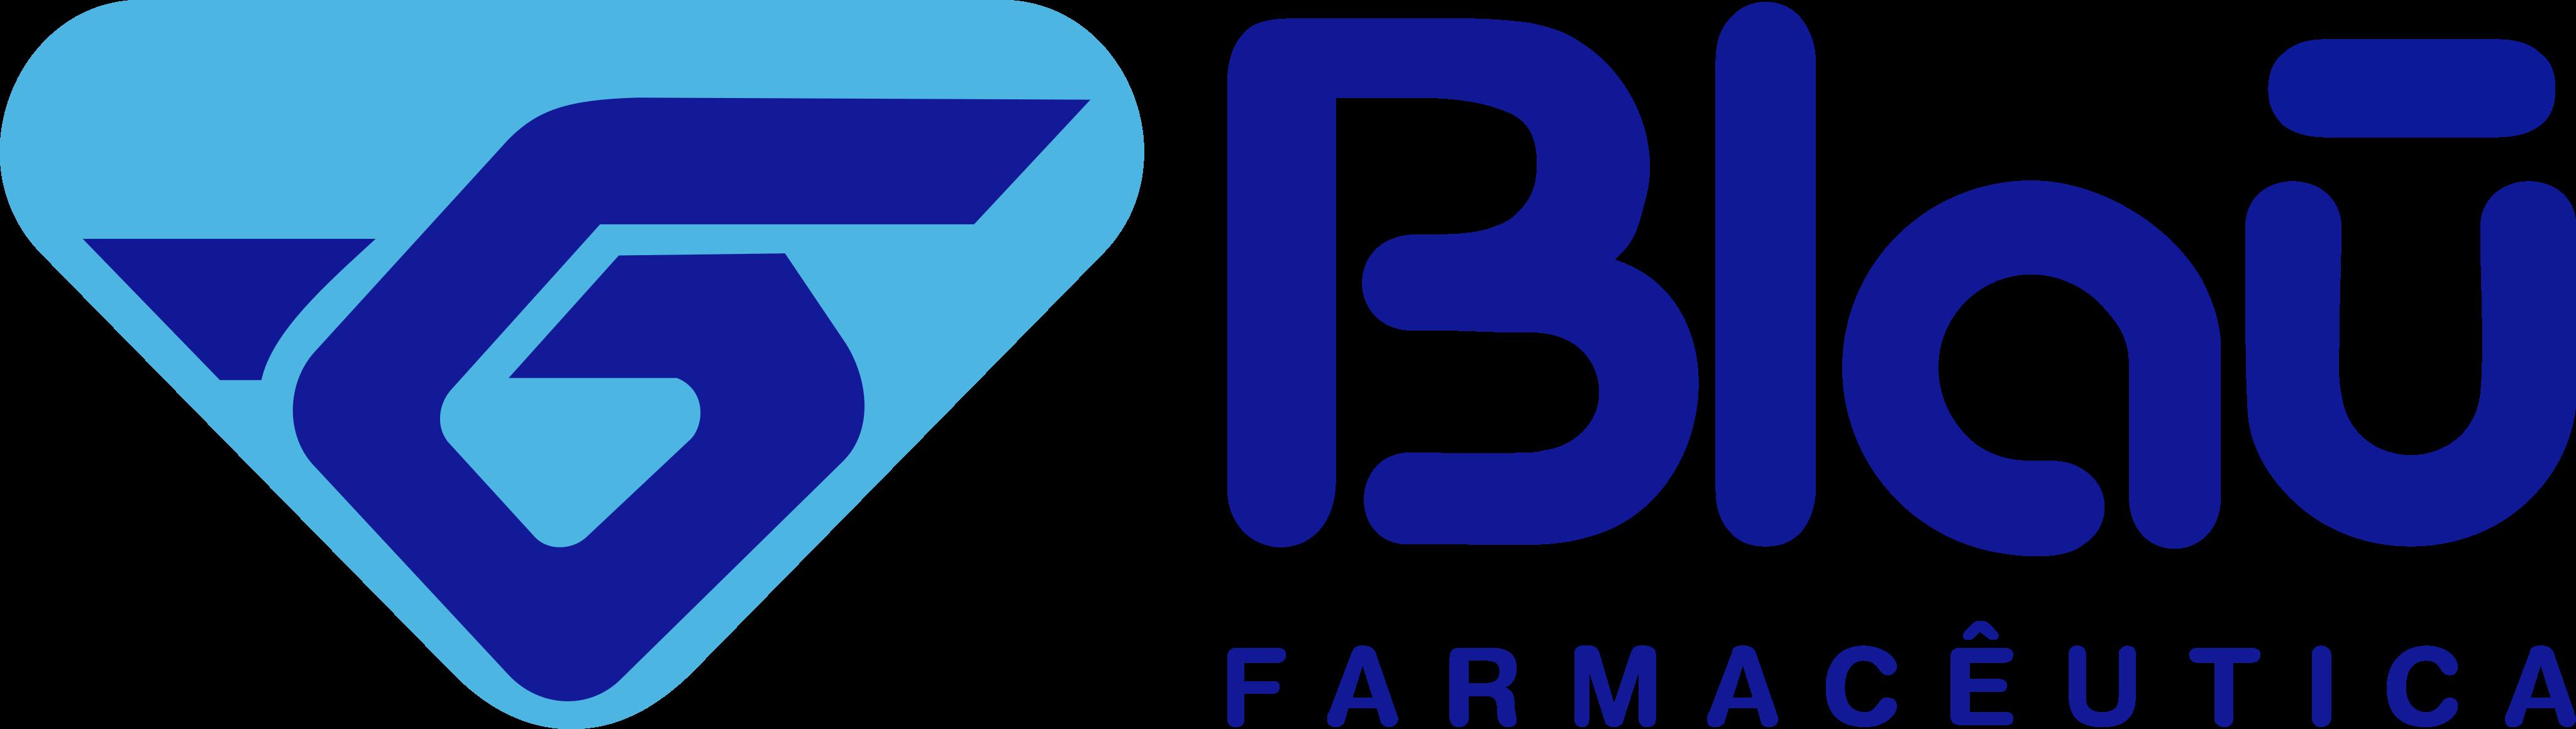 Blau Farmacêutica Logo.